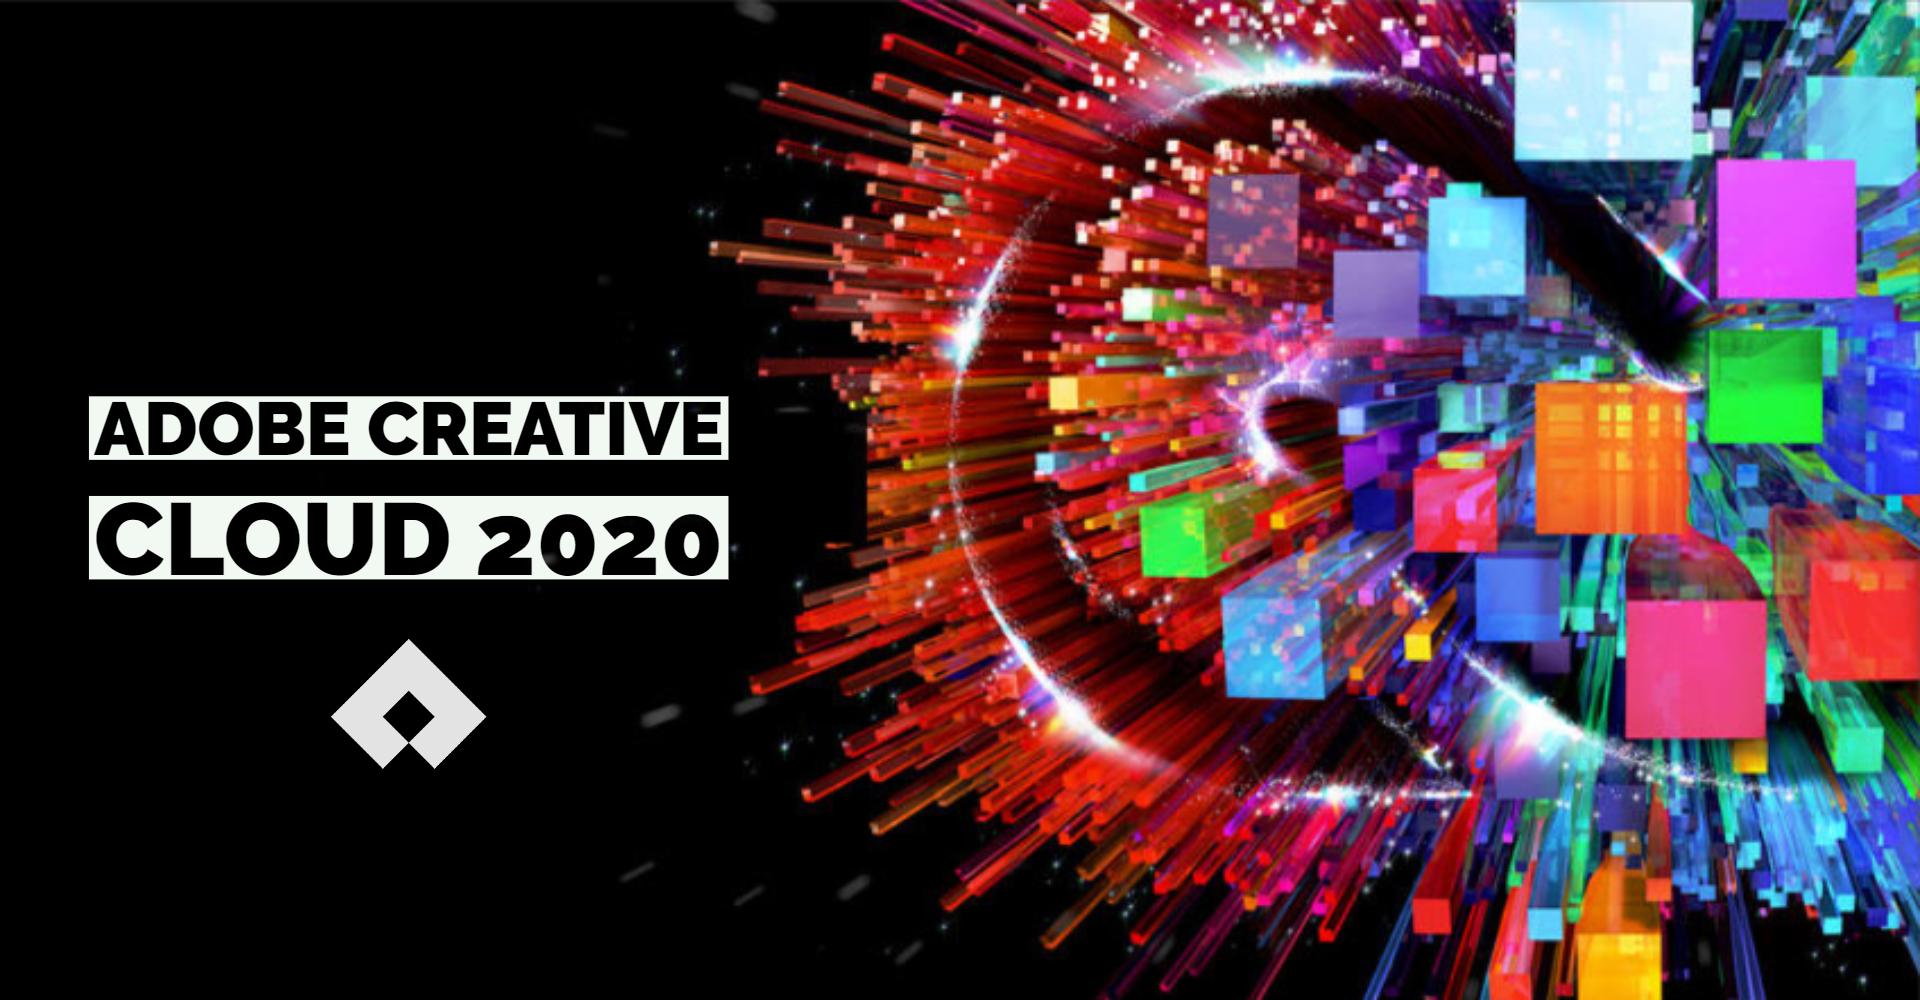 Adobe Creative Suite 2020